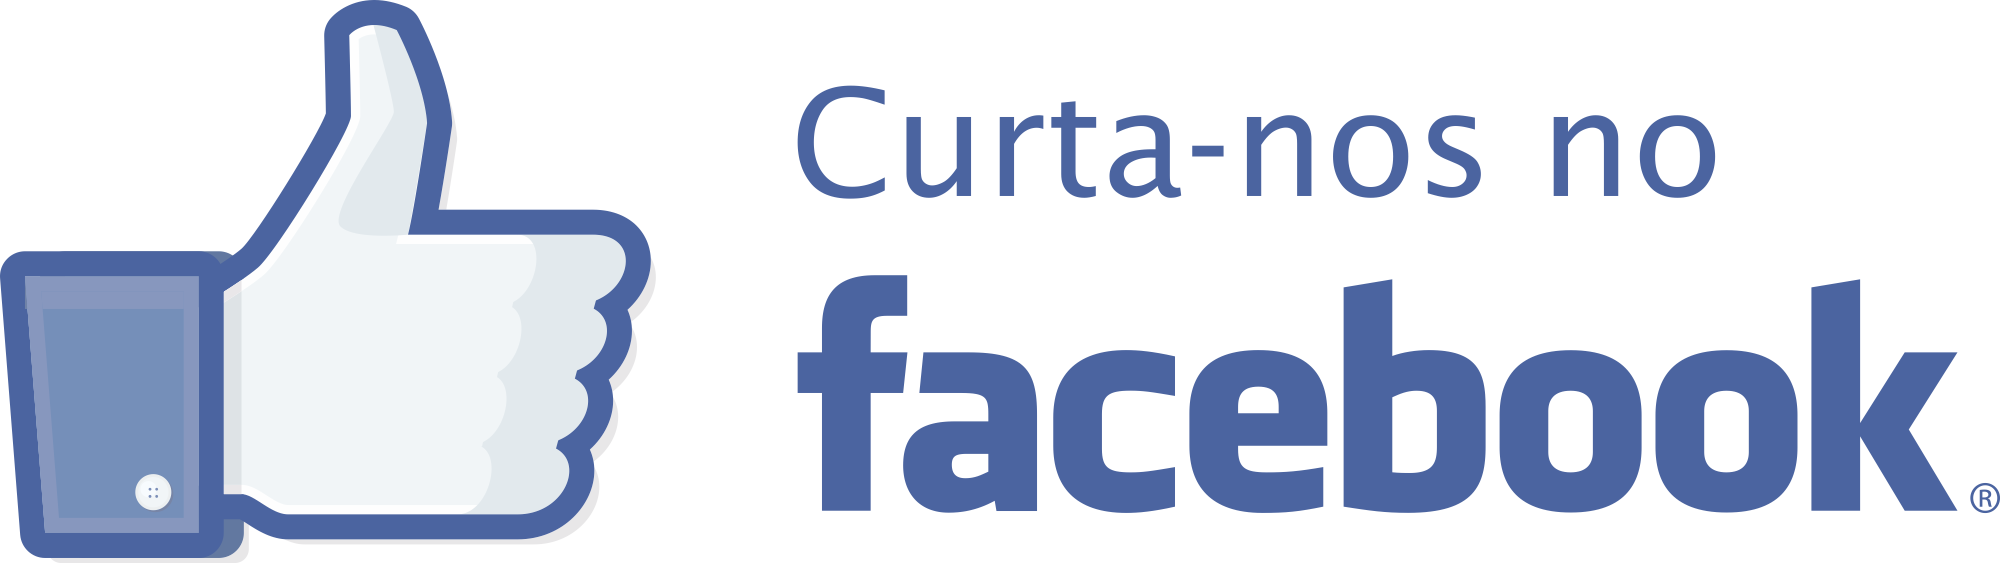 botao curtir facebook